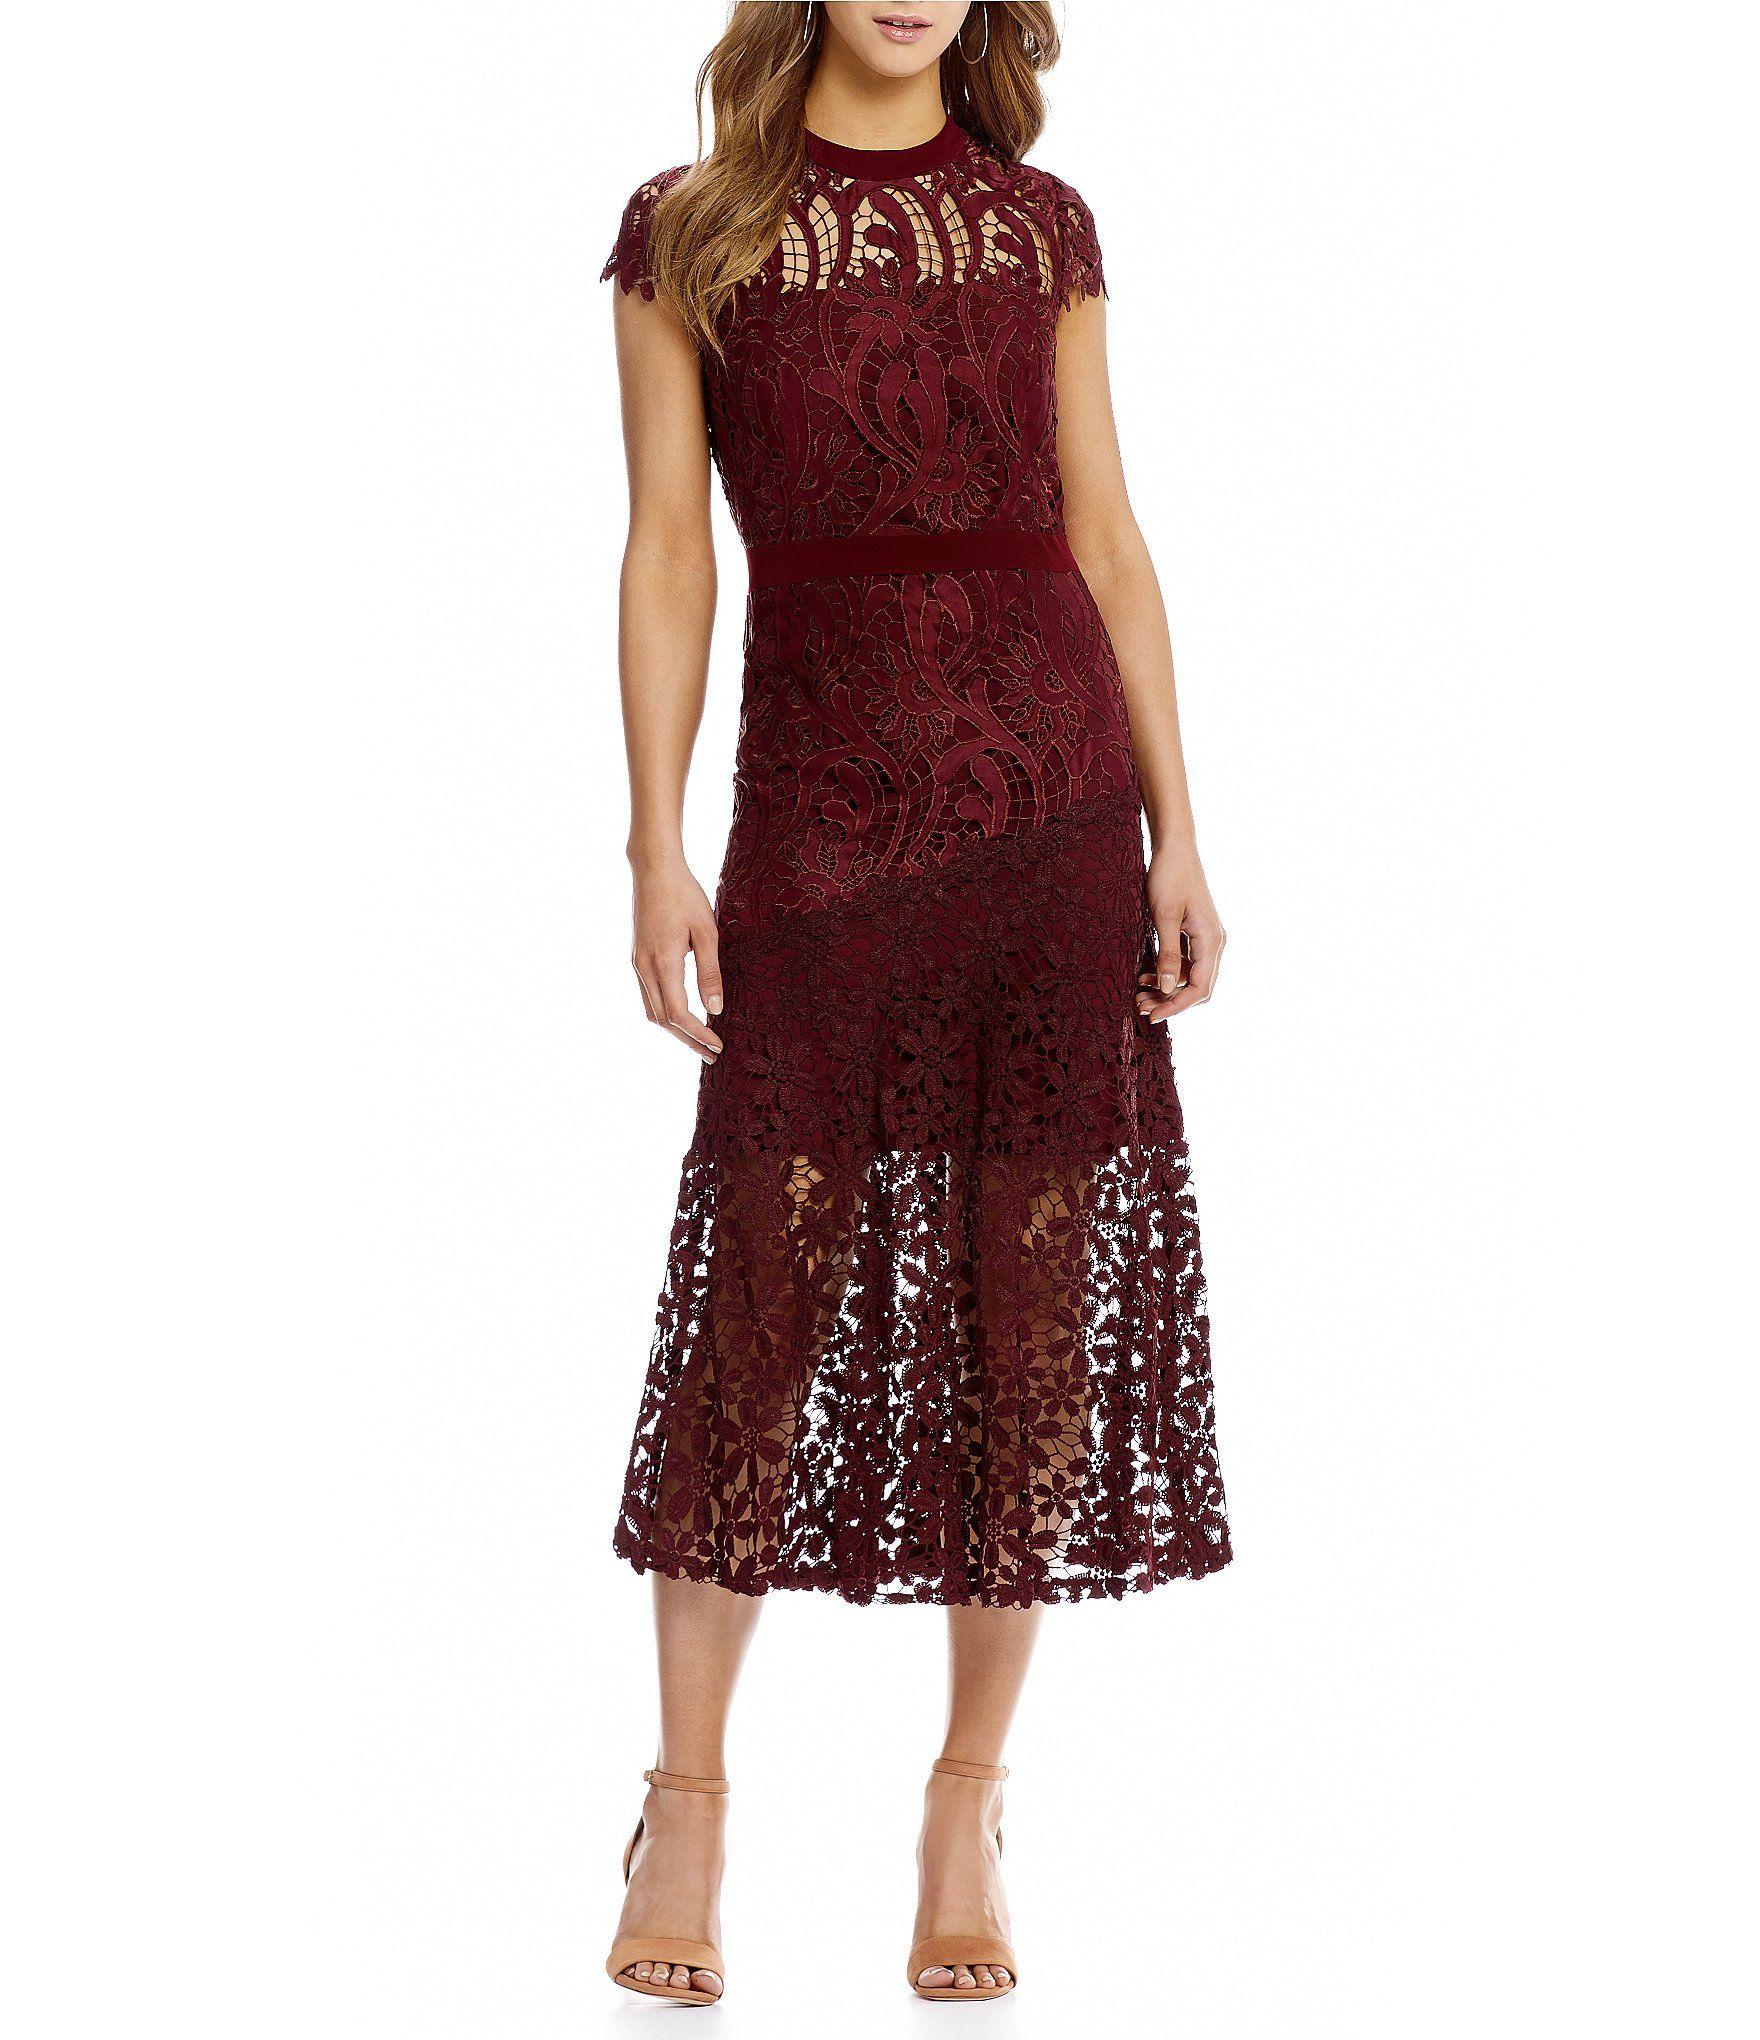 Antonio melani macie lace dress dillards dresses pinterest antonio melani macie lace dress dillards ombrellifo Gallery